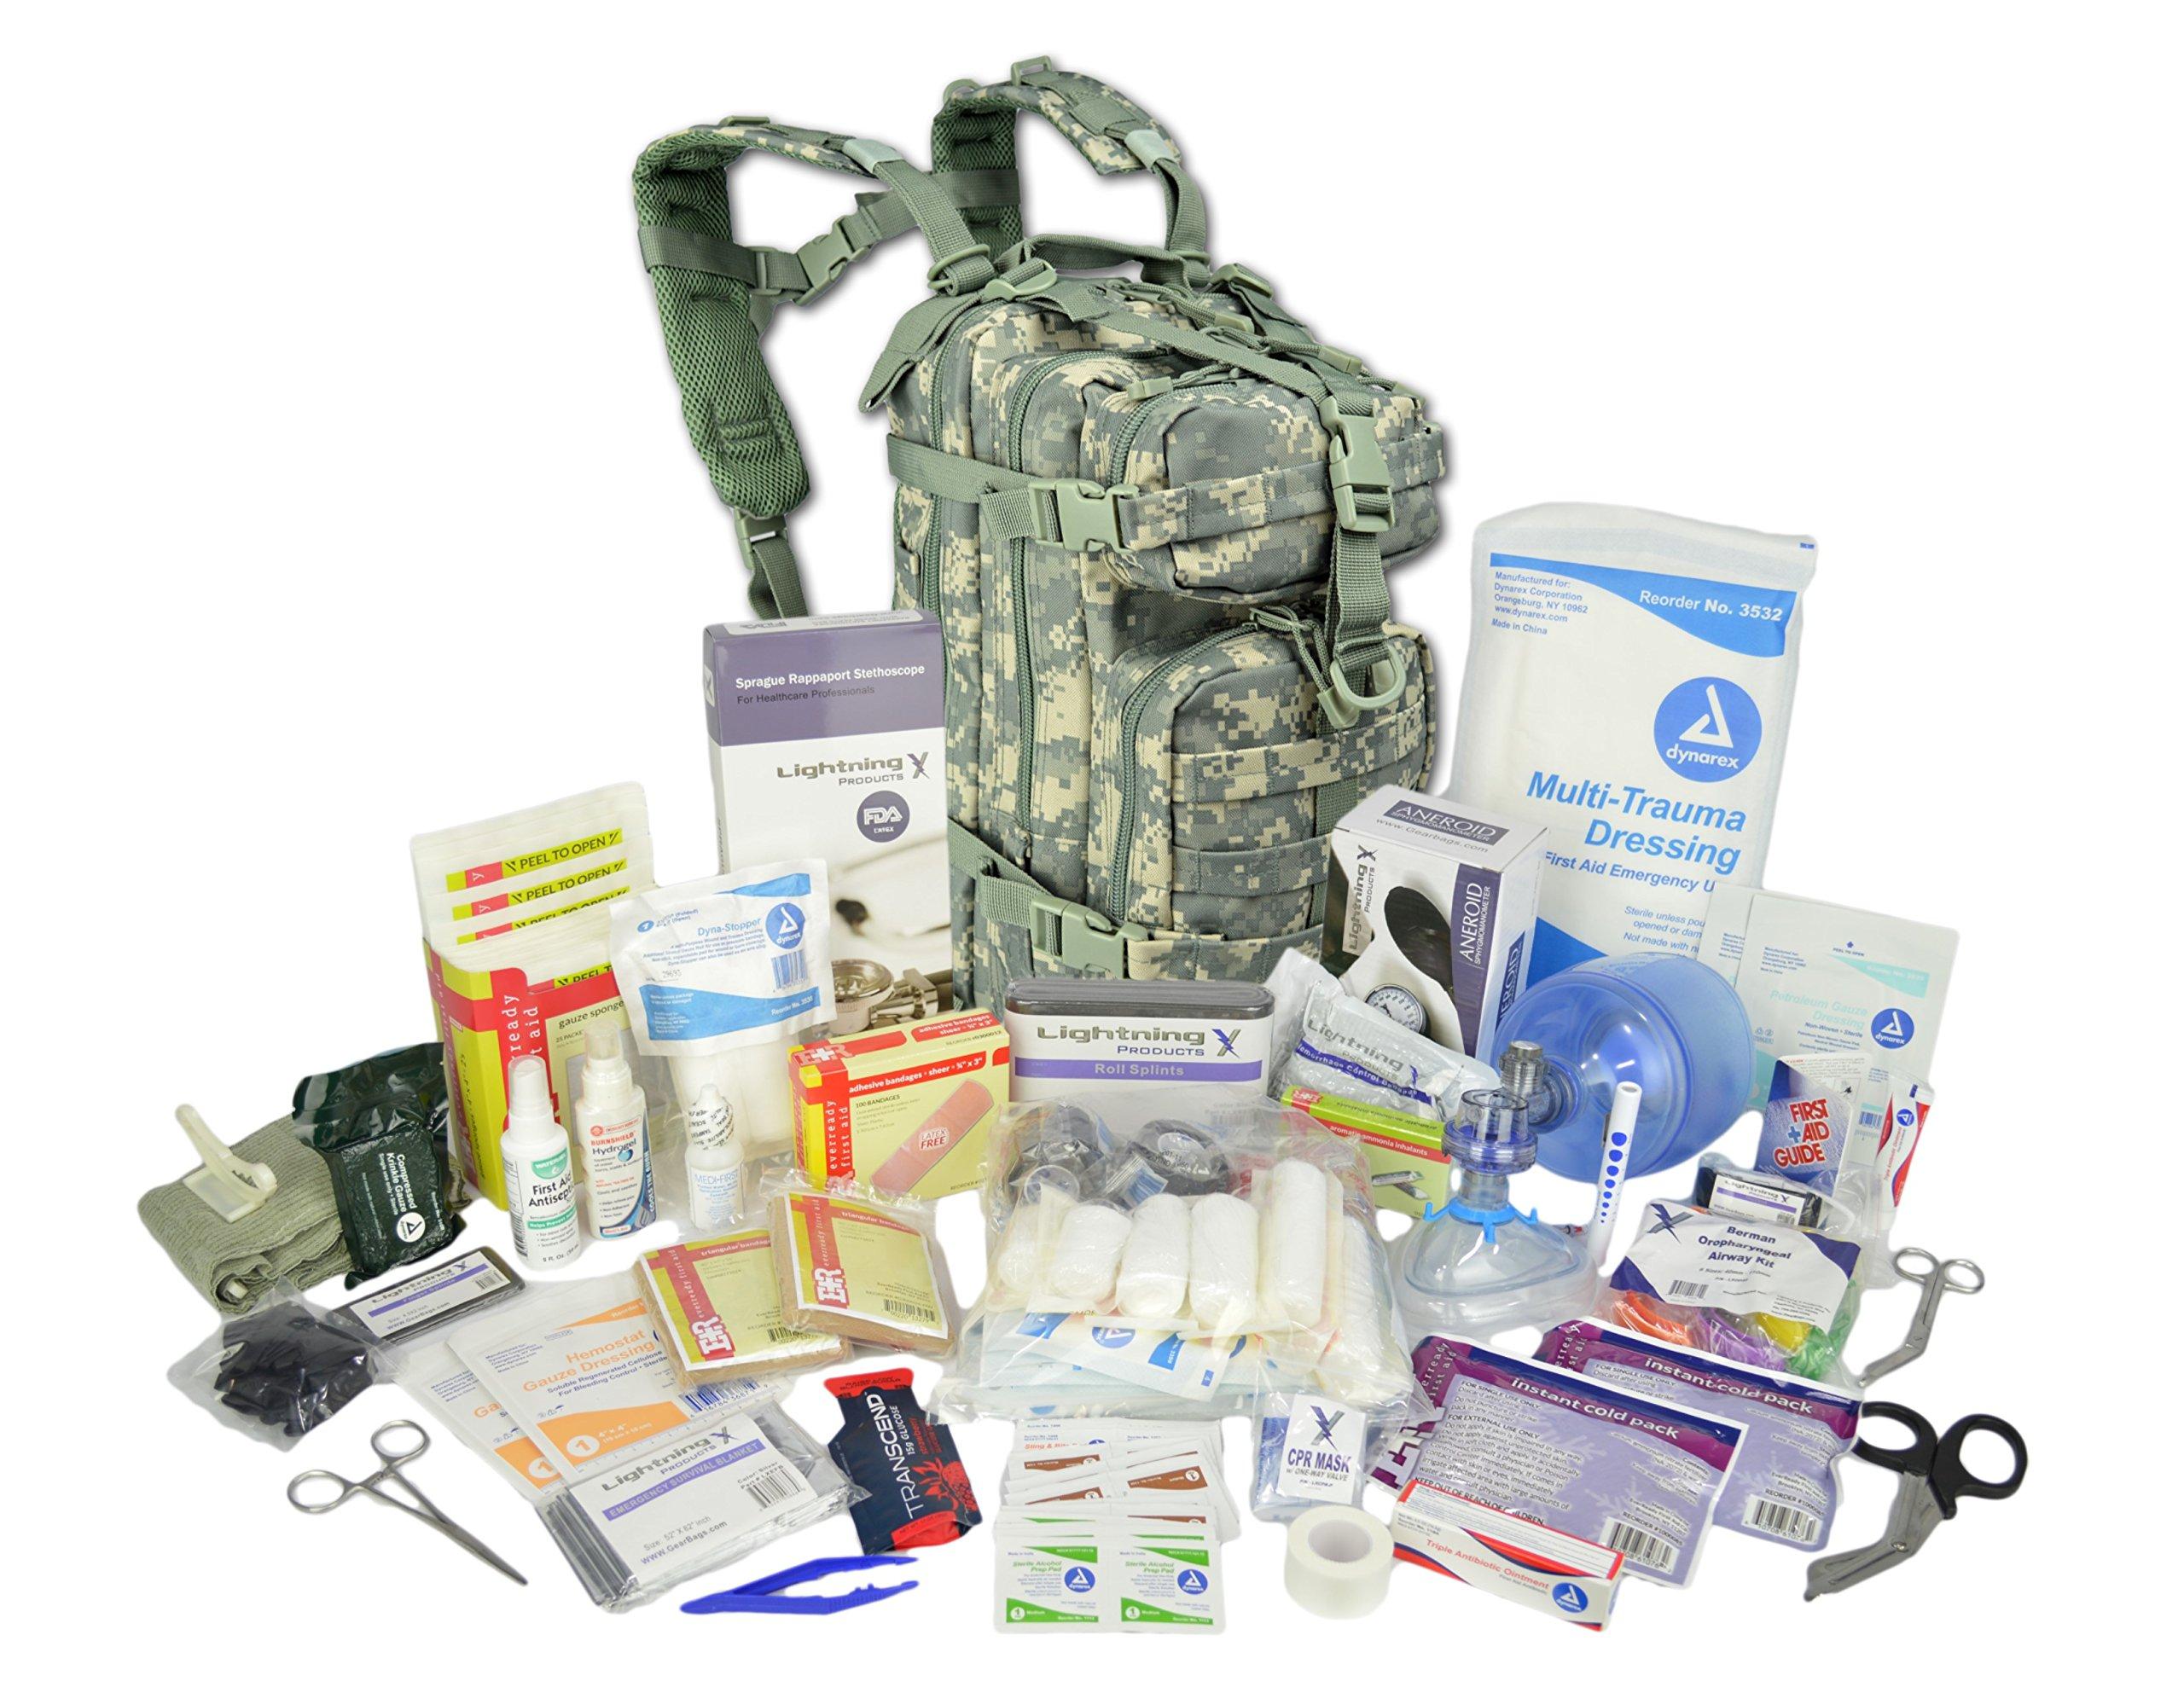 Lightning X Stocked EMS/EMT Trauma & Bleeding First Aid Responder Medical Backpack + Kit - ACU